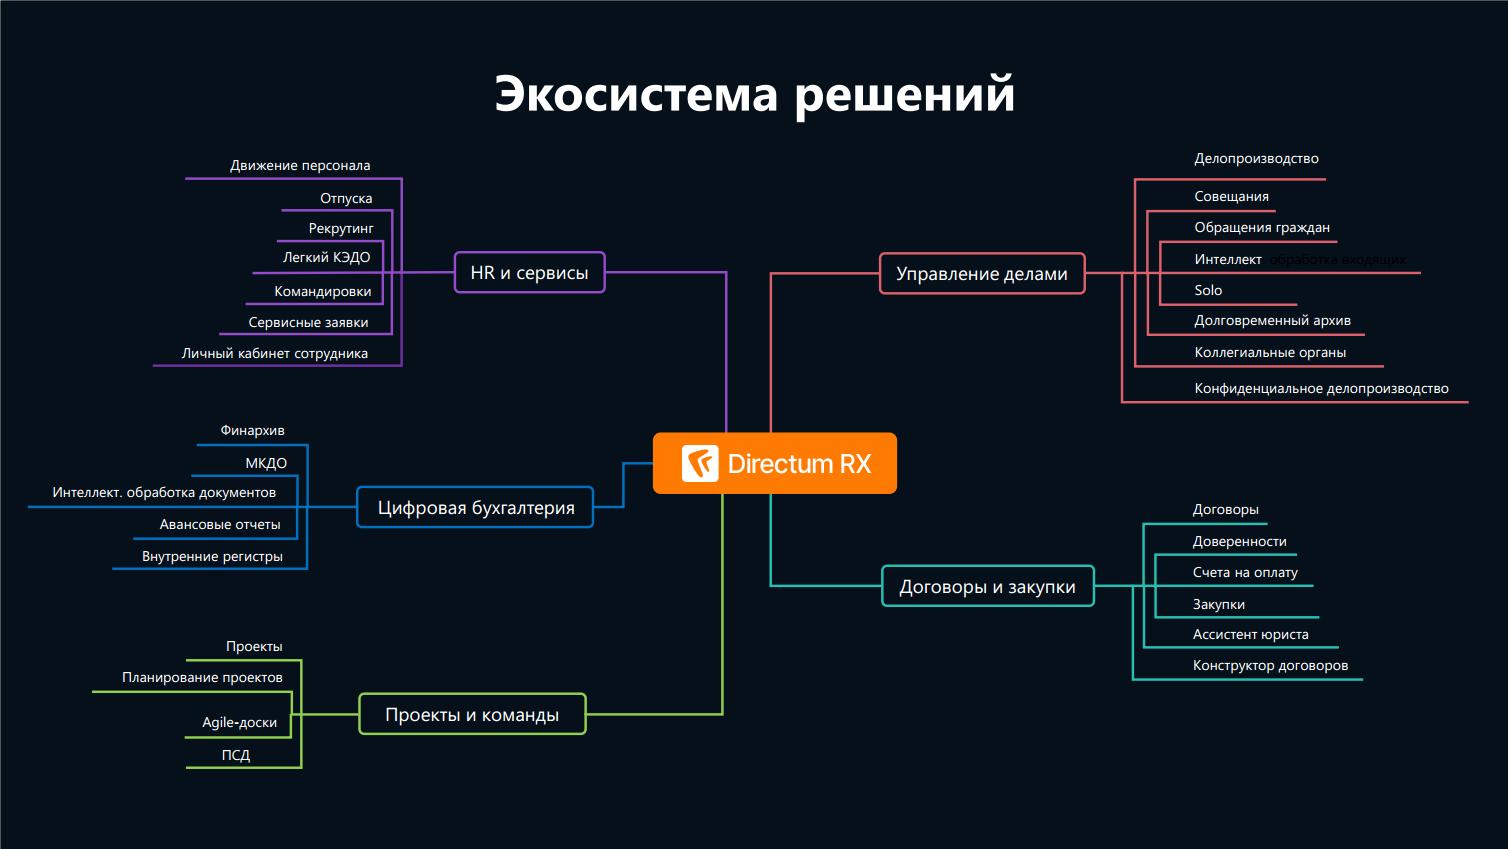 Экосистема решений Directum